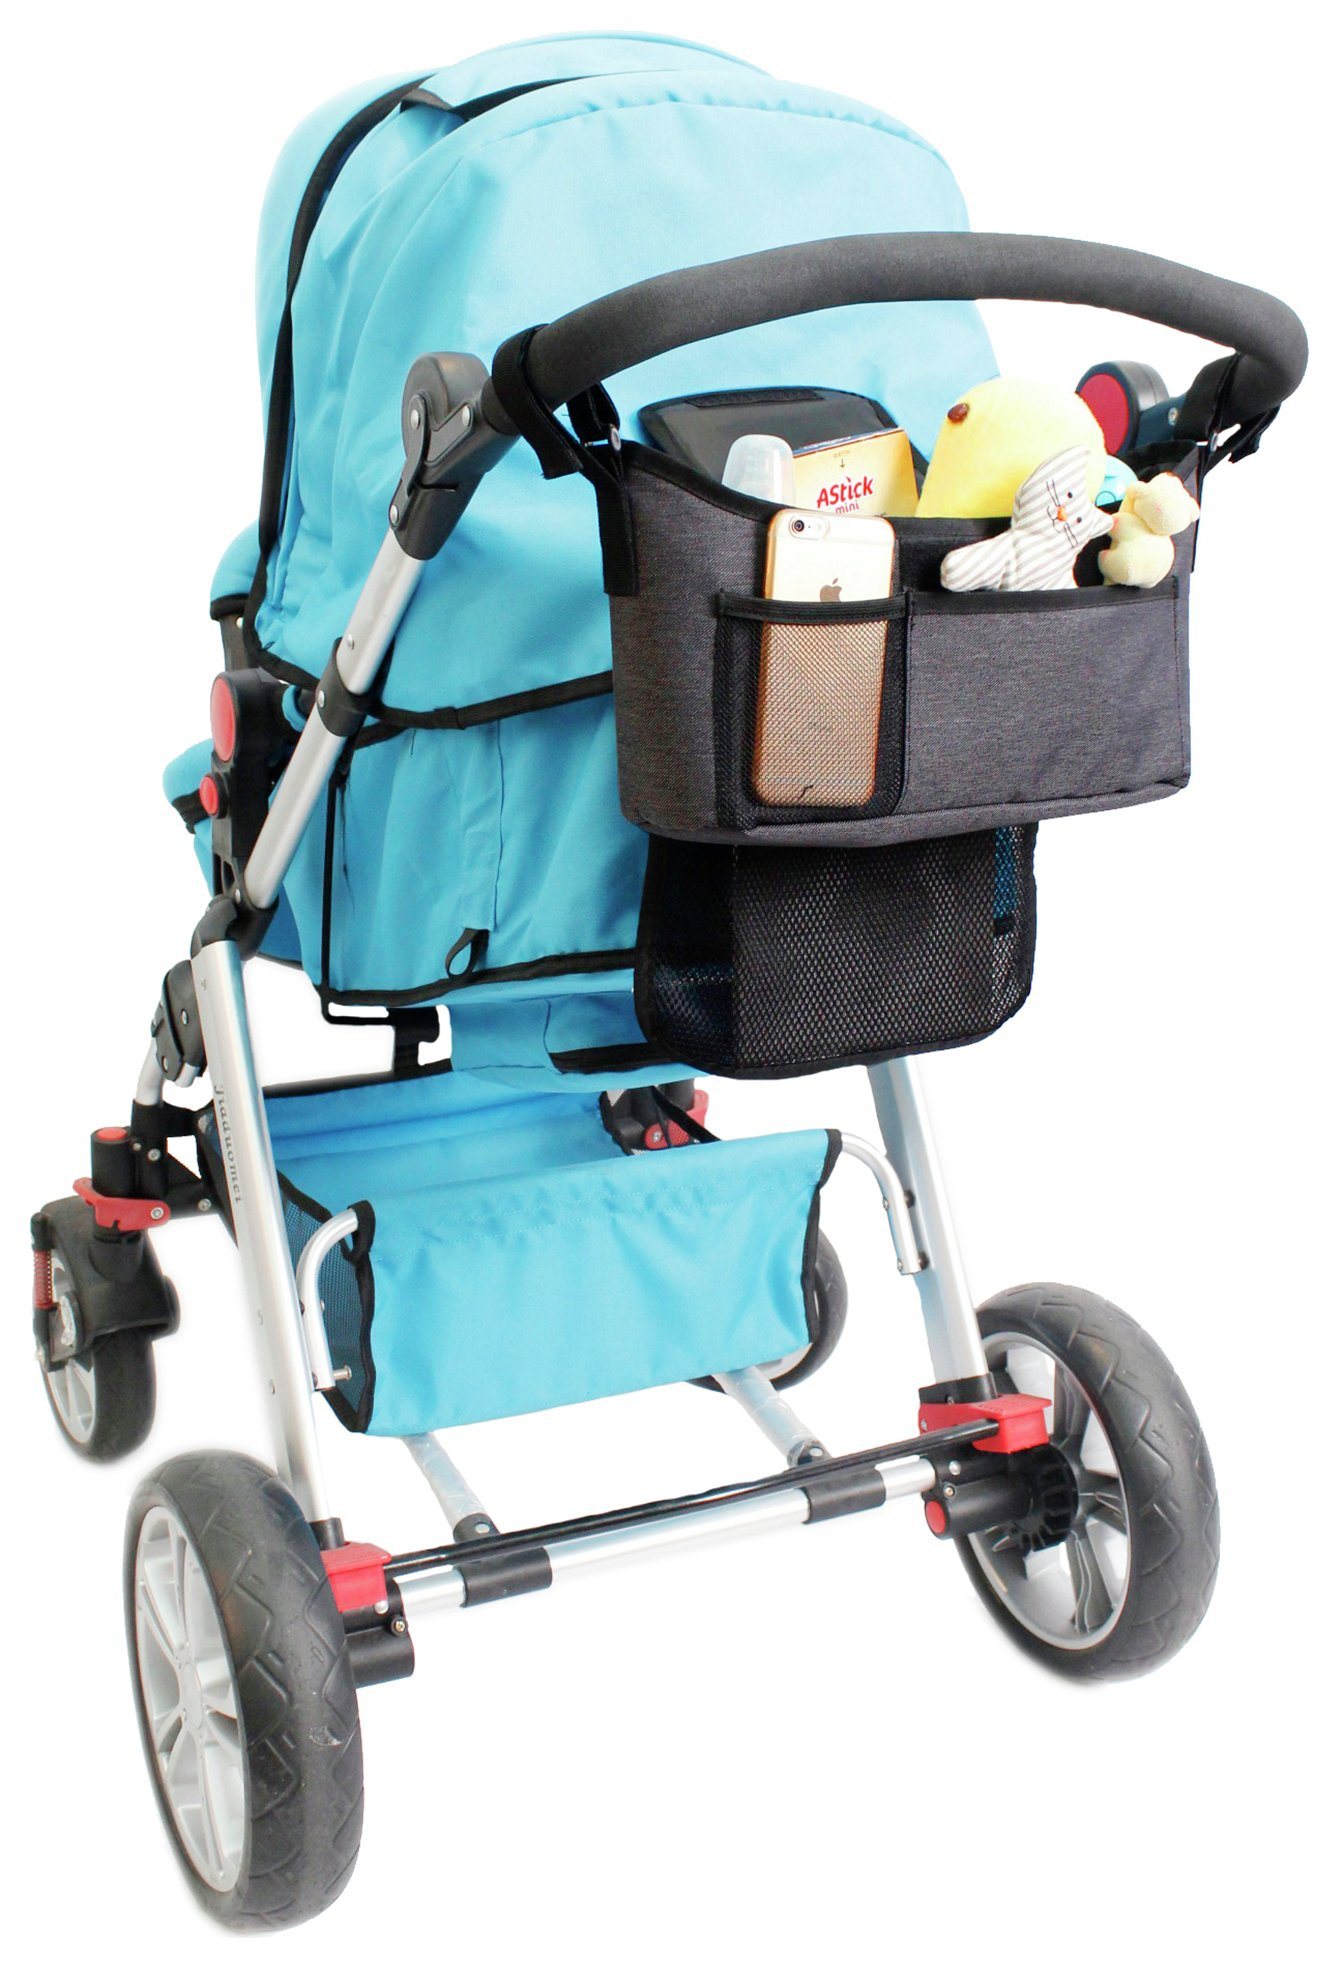 Image of Babydan Stroller Organiser